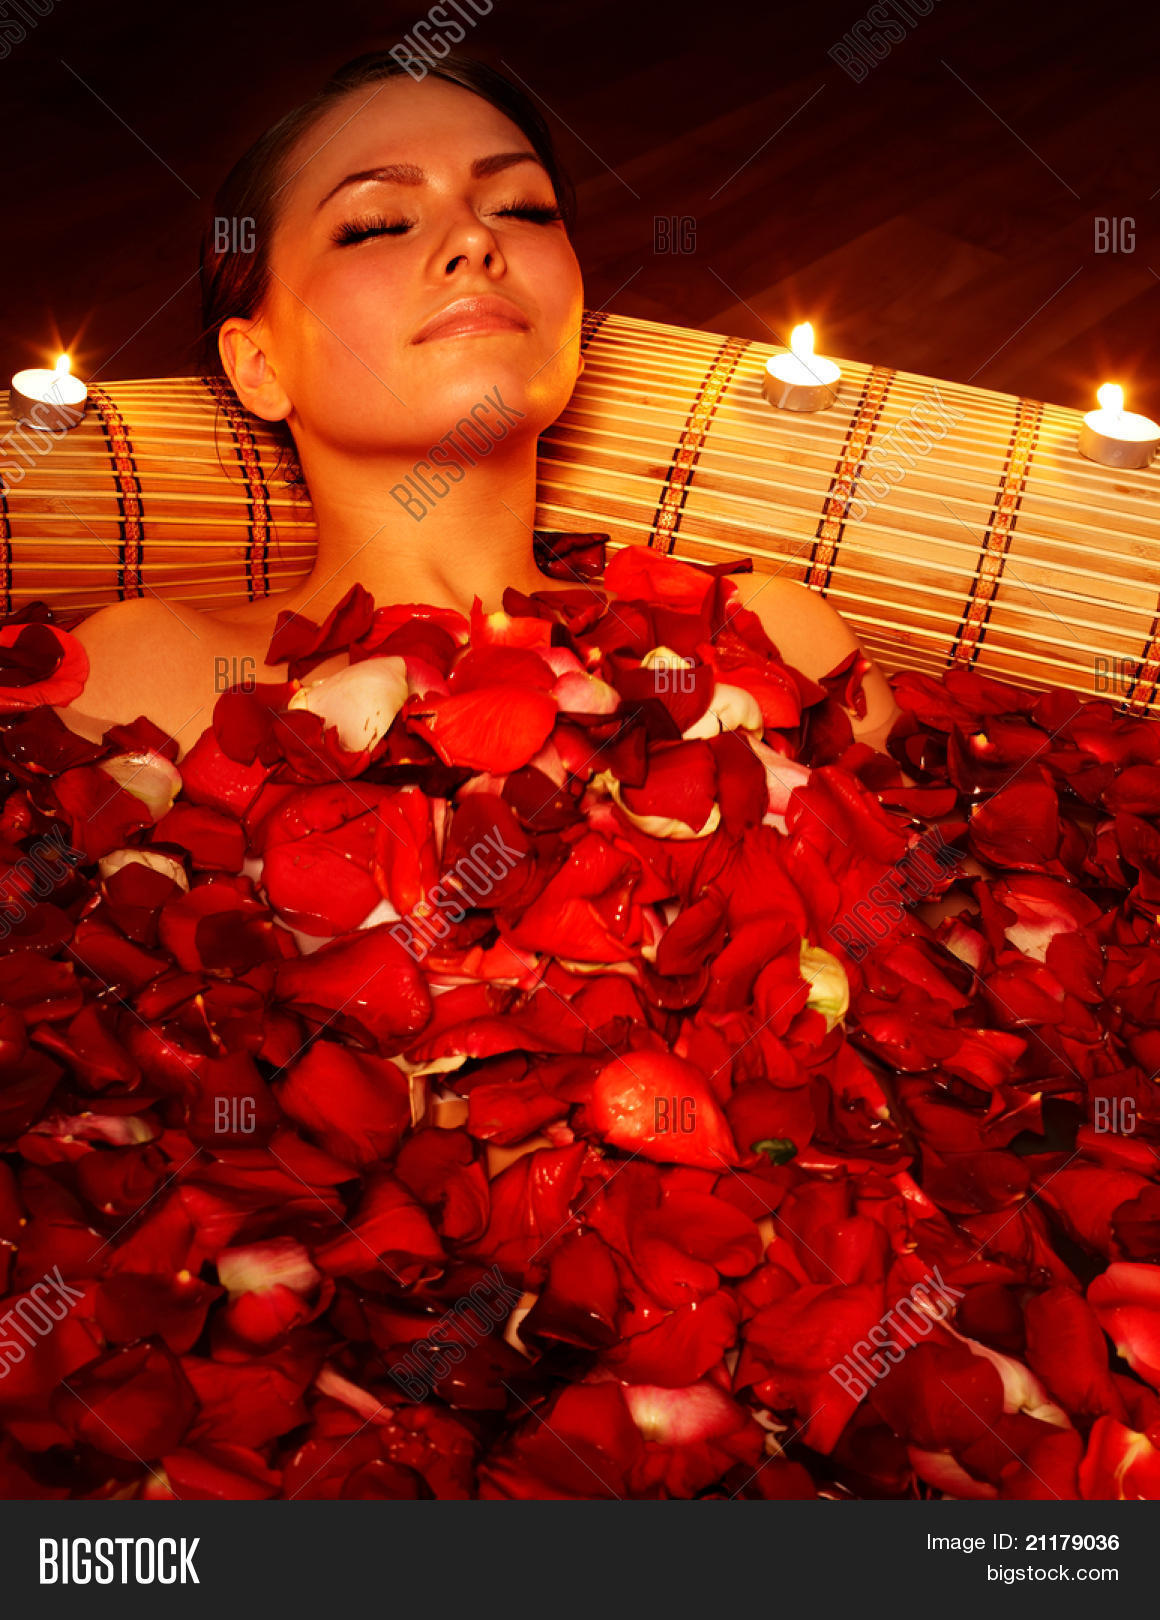 Beautiful Girl Jacuzzi Rose Petal Image & Photo | Bigstock